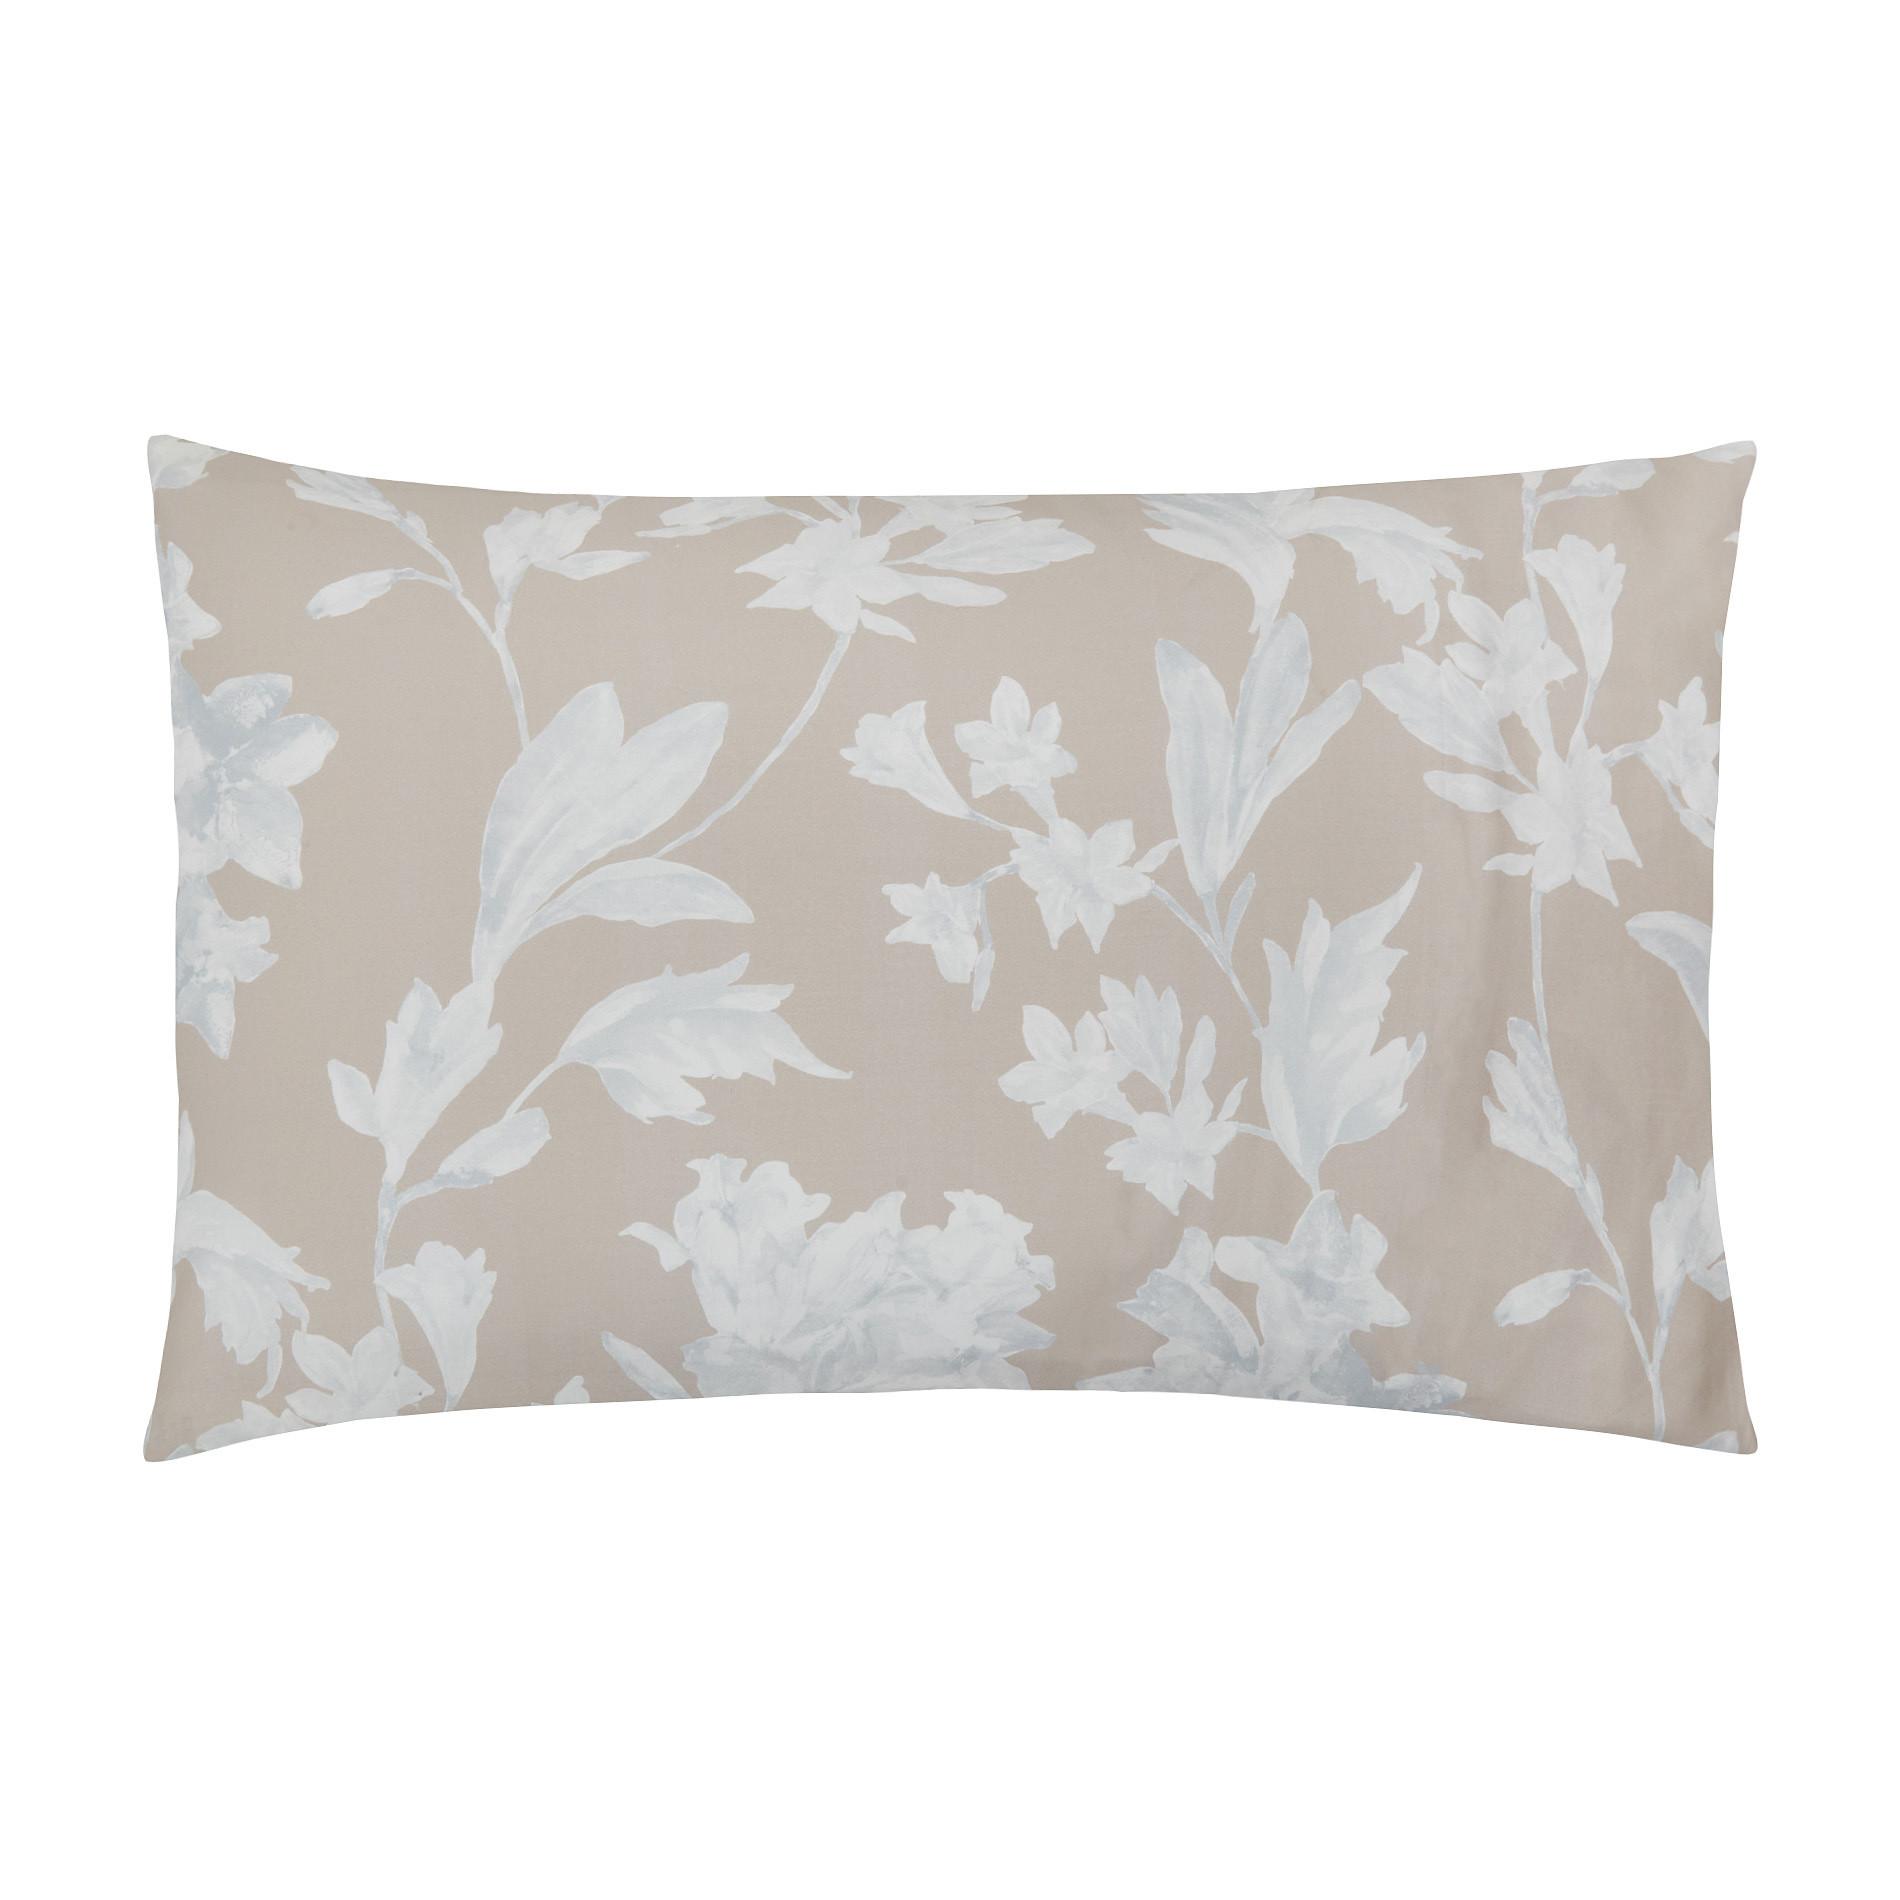 Federa raso di cotone motivo floreale Portofino, Beige, large image number 0